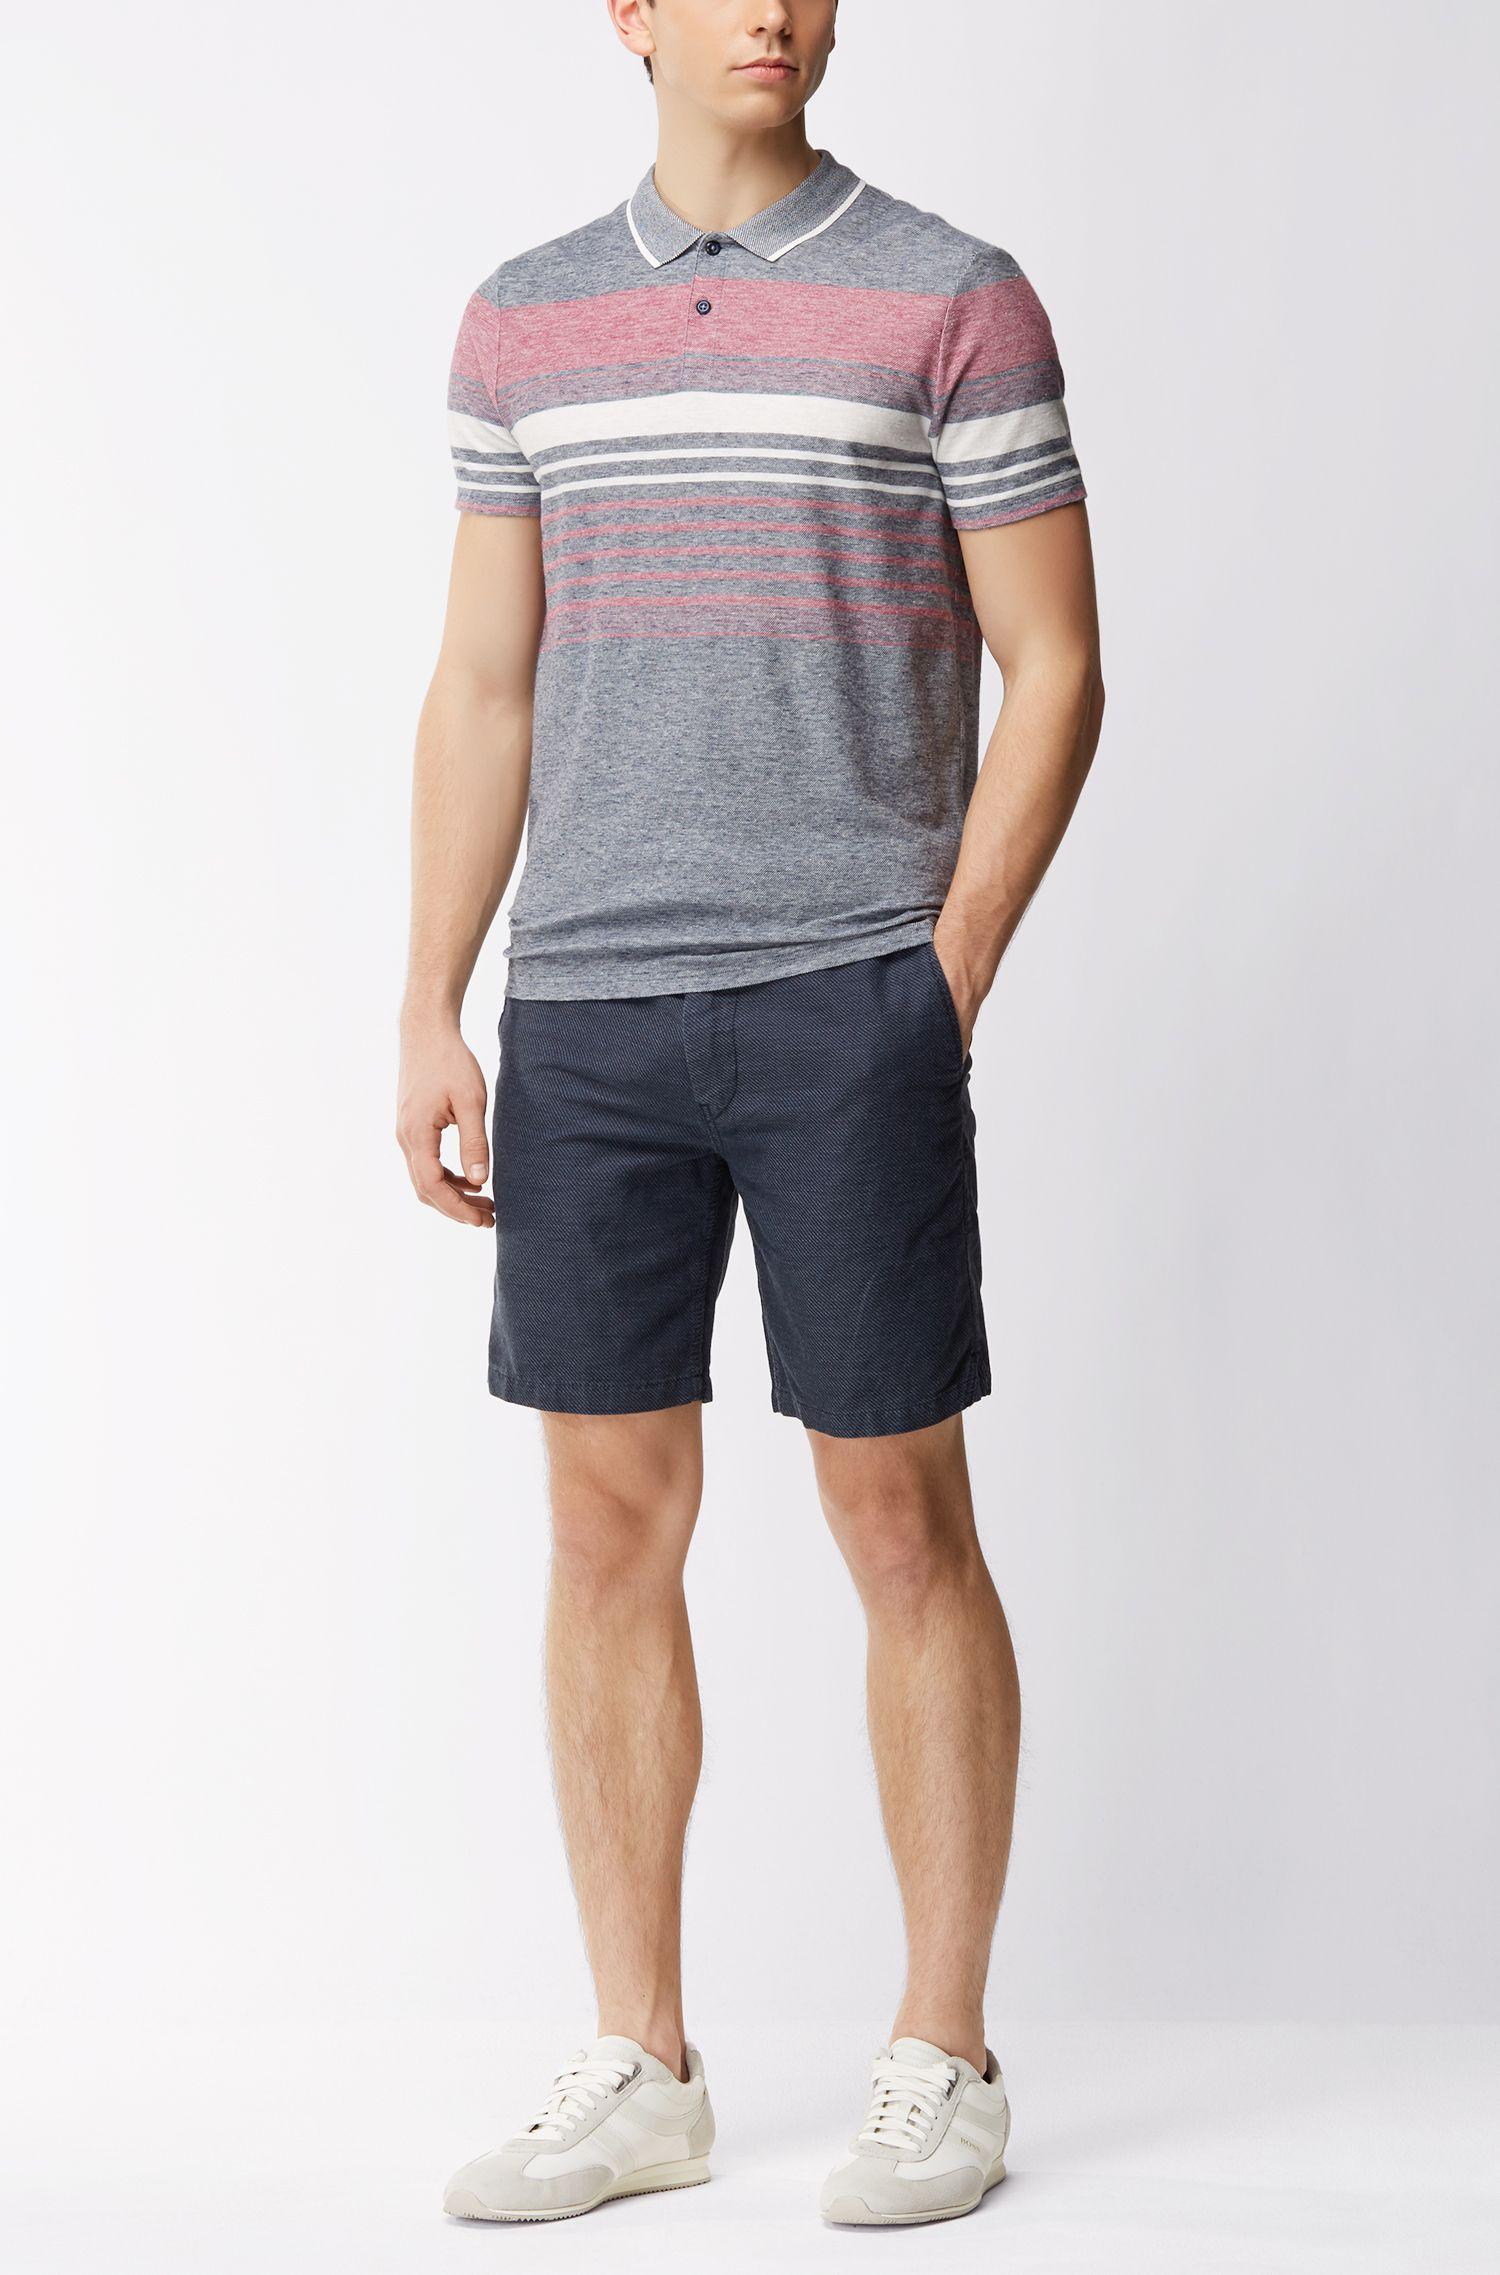 Gestreiftes Relaxed-Fit Poloshirt aus meliertem Baumwoll-Mix mit Leinen